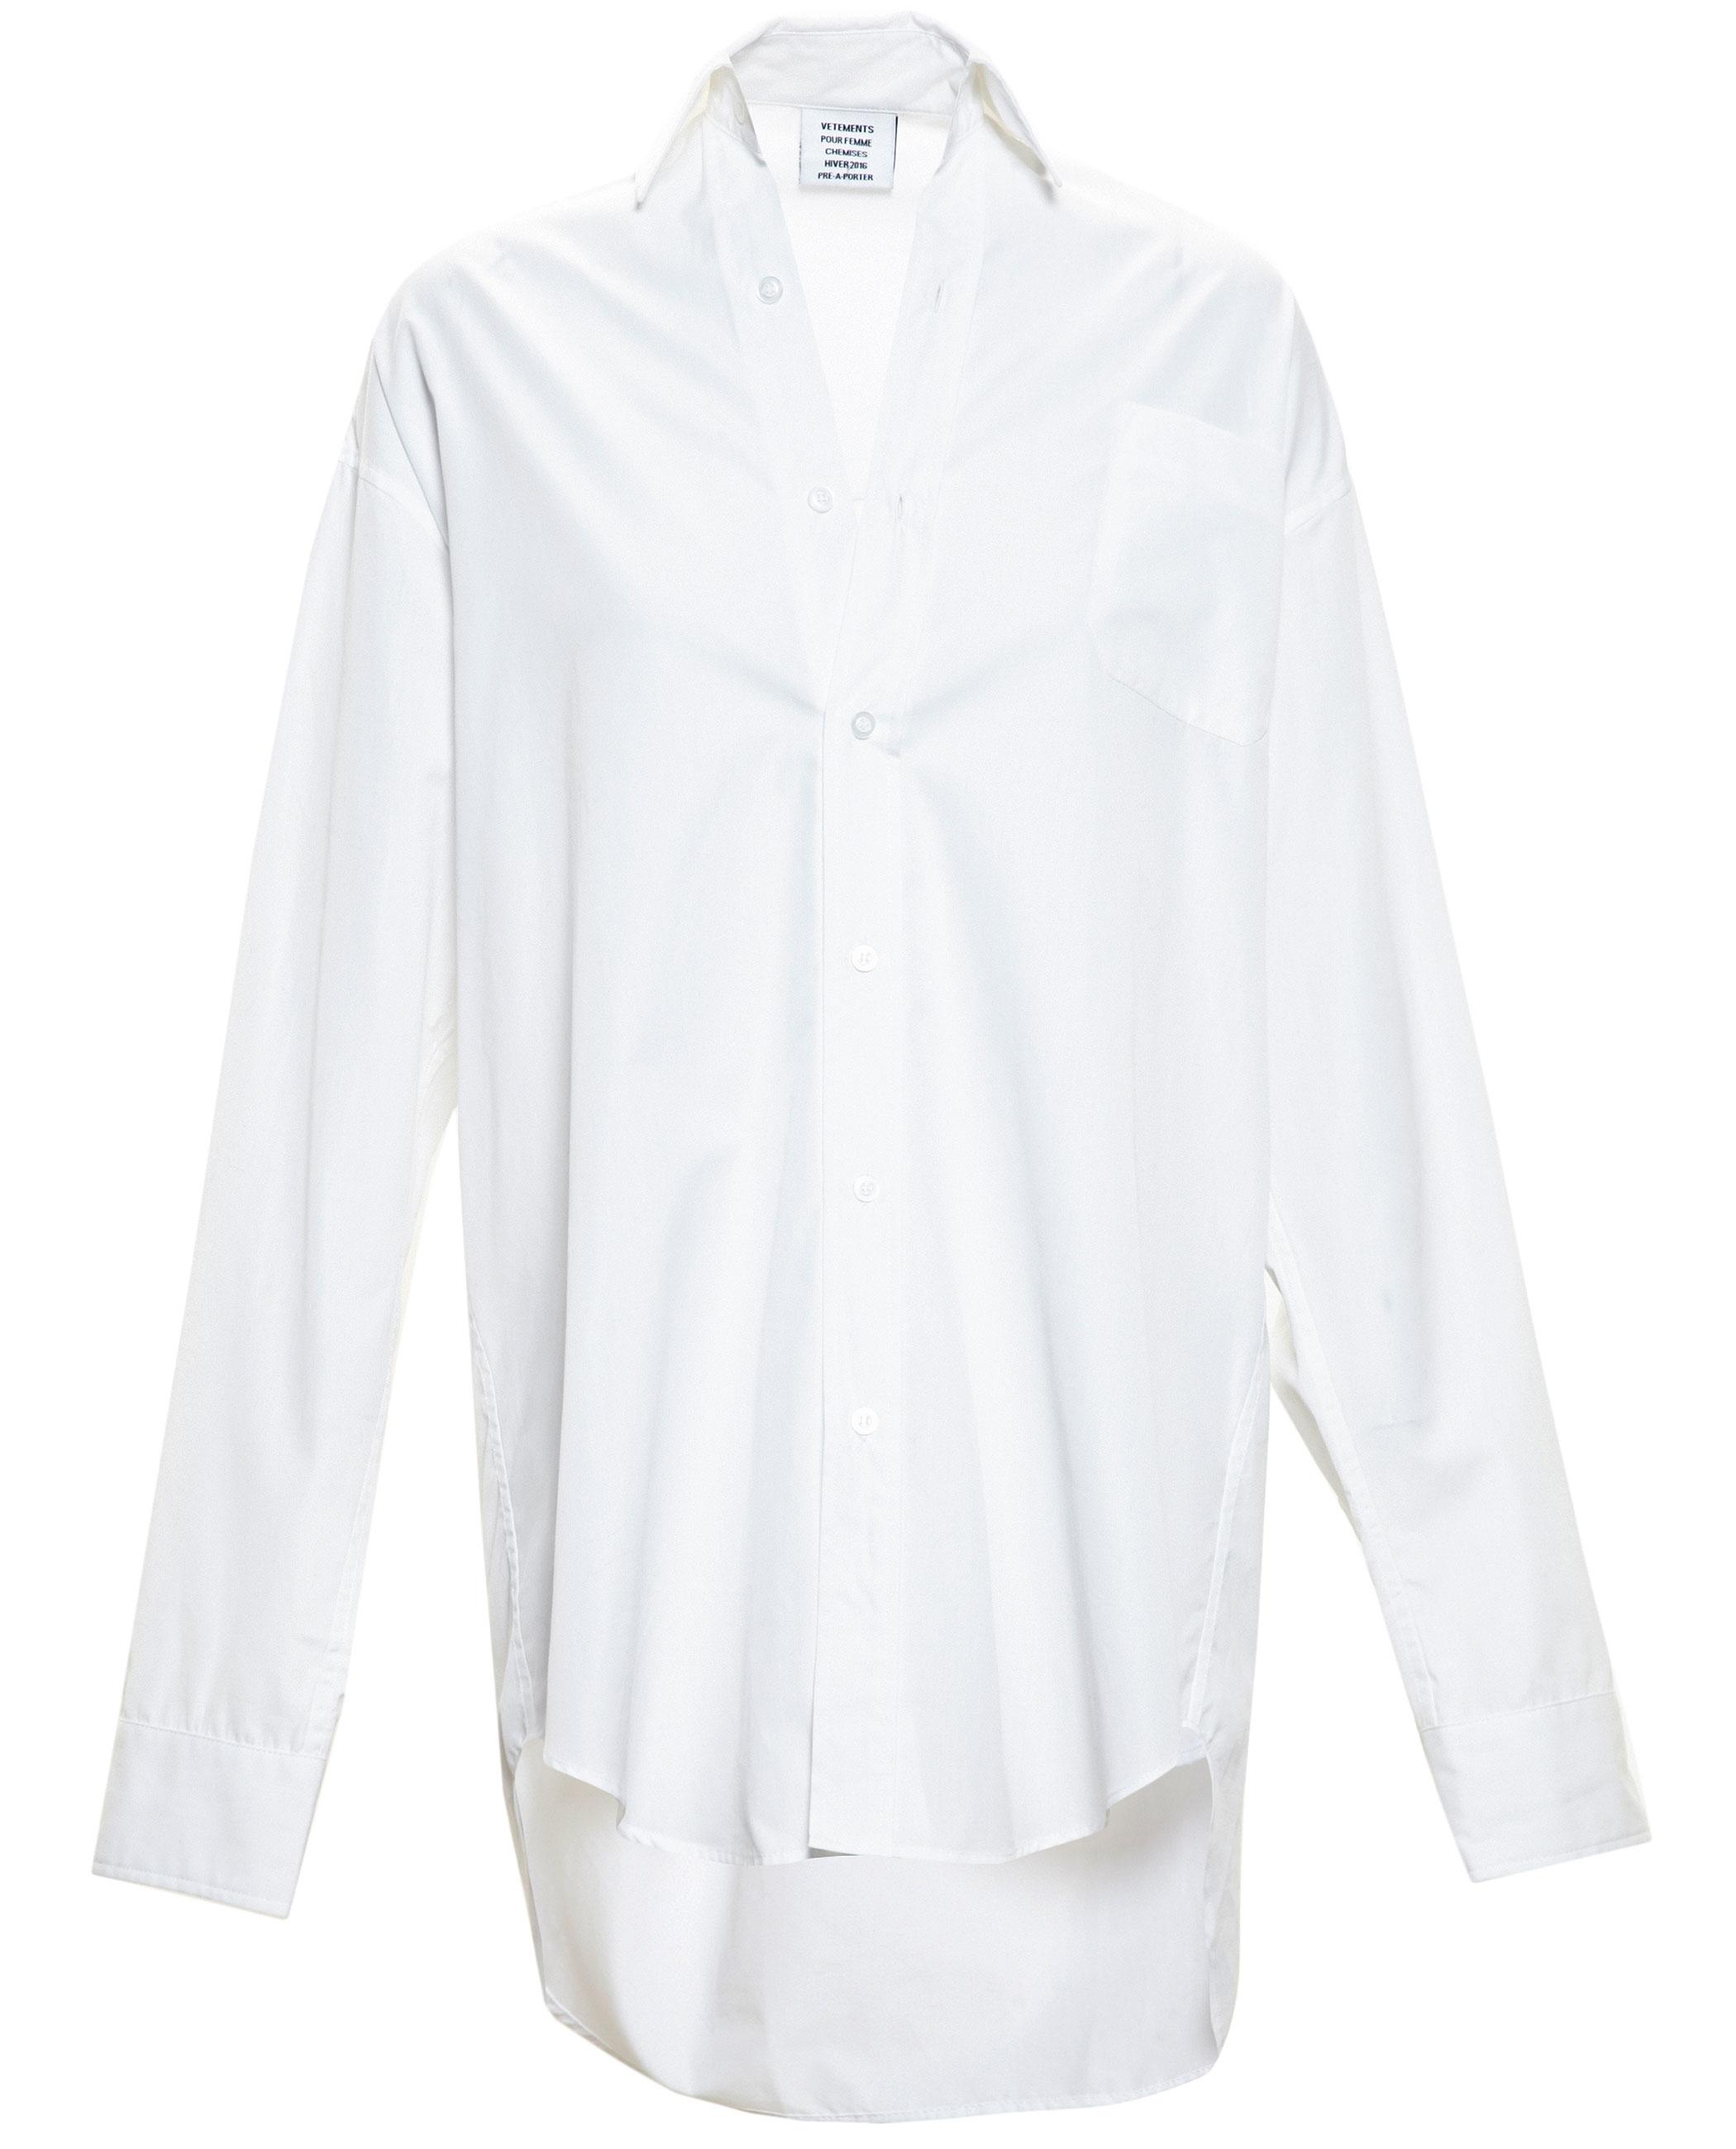 White Oversized Shirt River Island